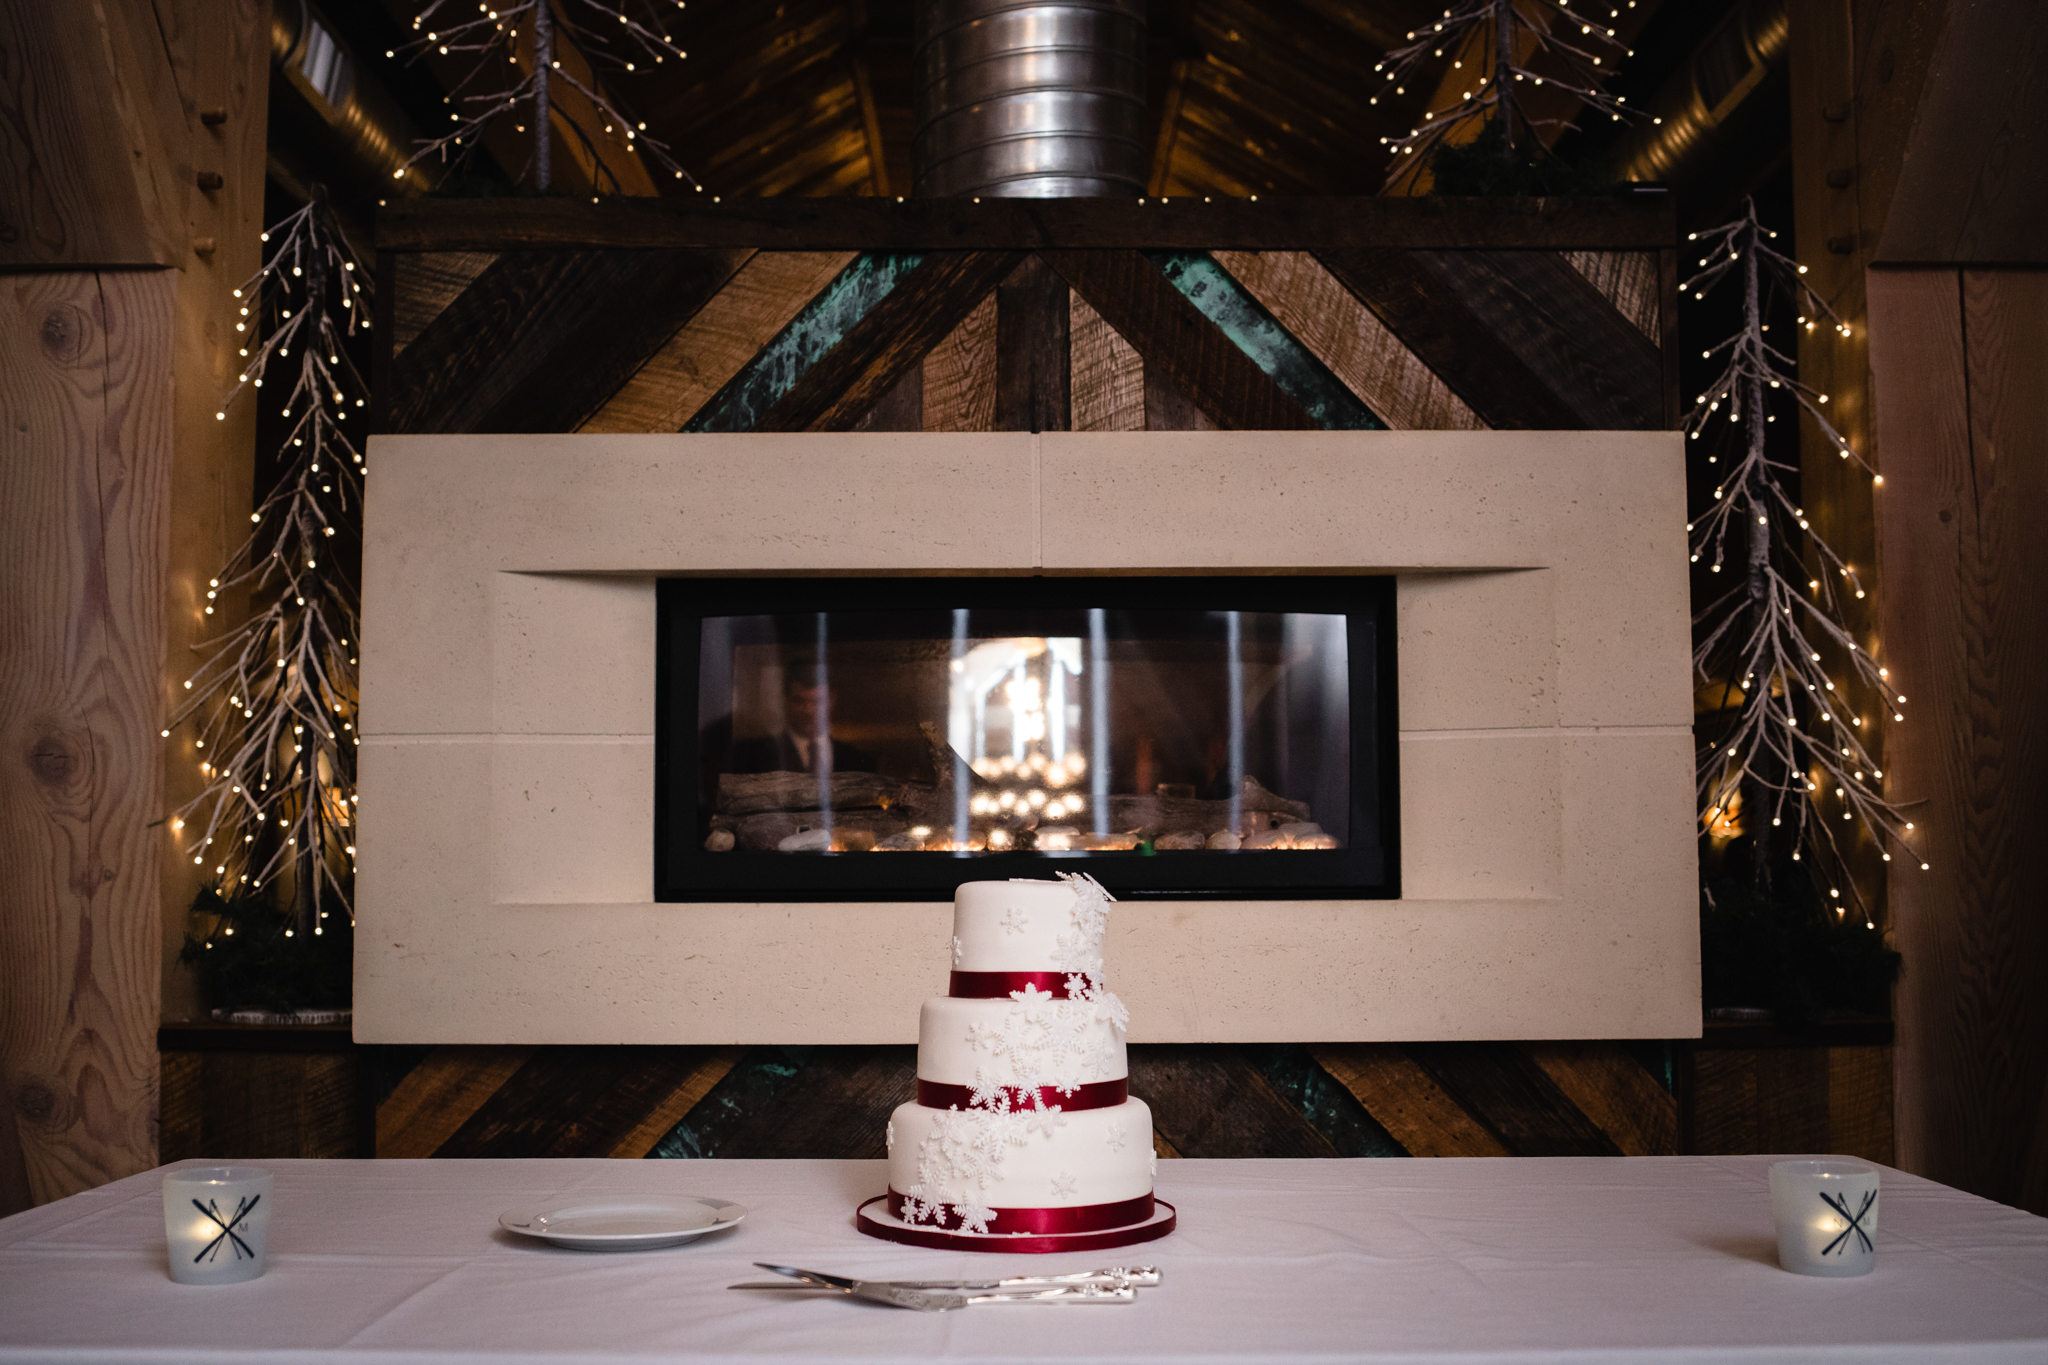 Ellicottville-Brewing-Company-EBC-Buffalo-Wedding-Vita-Bella-Photography-0151.jpg